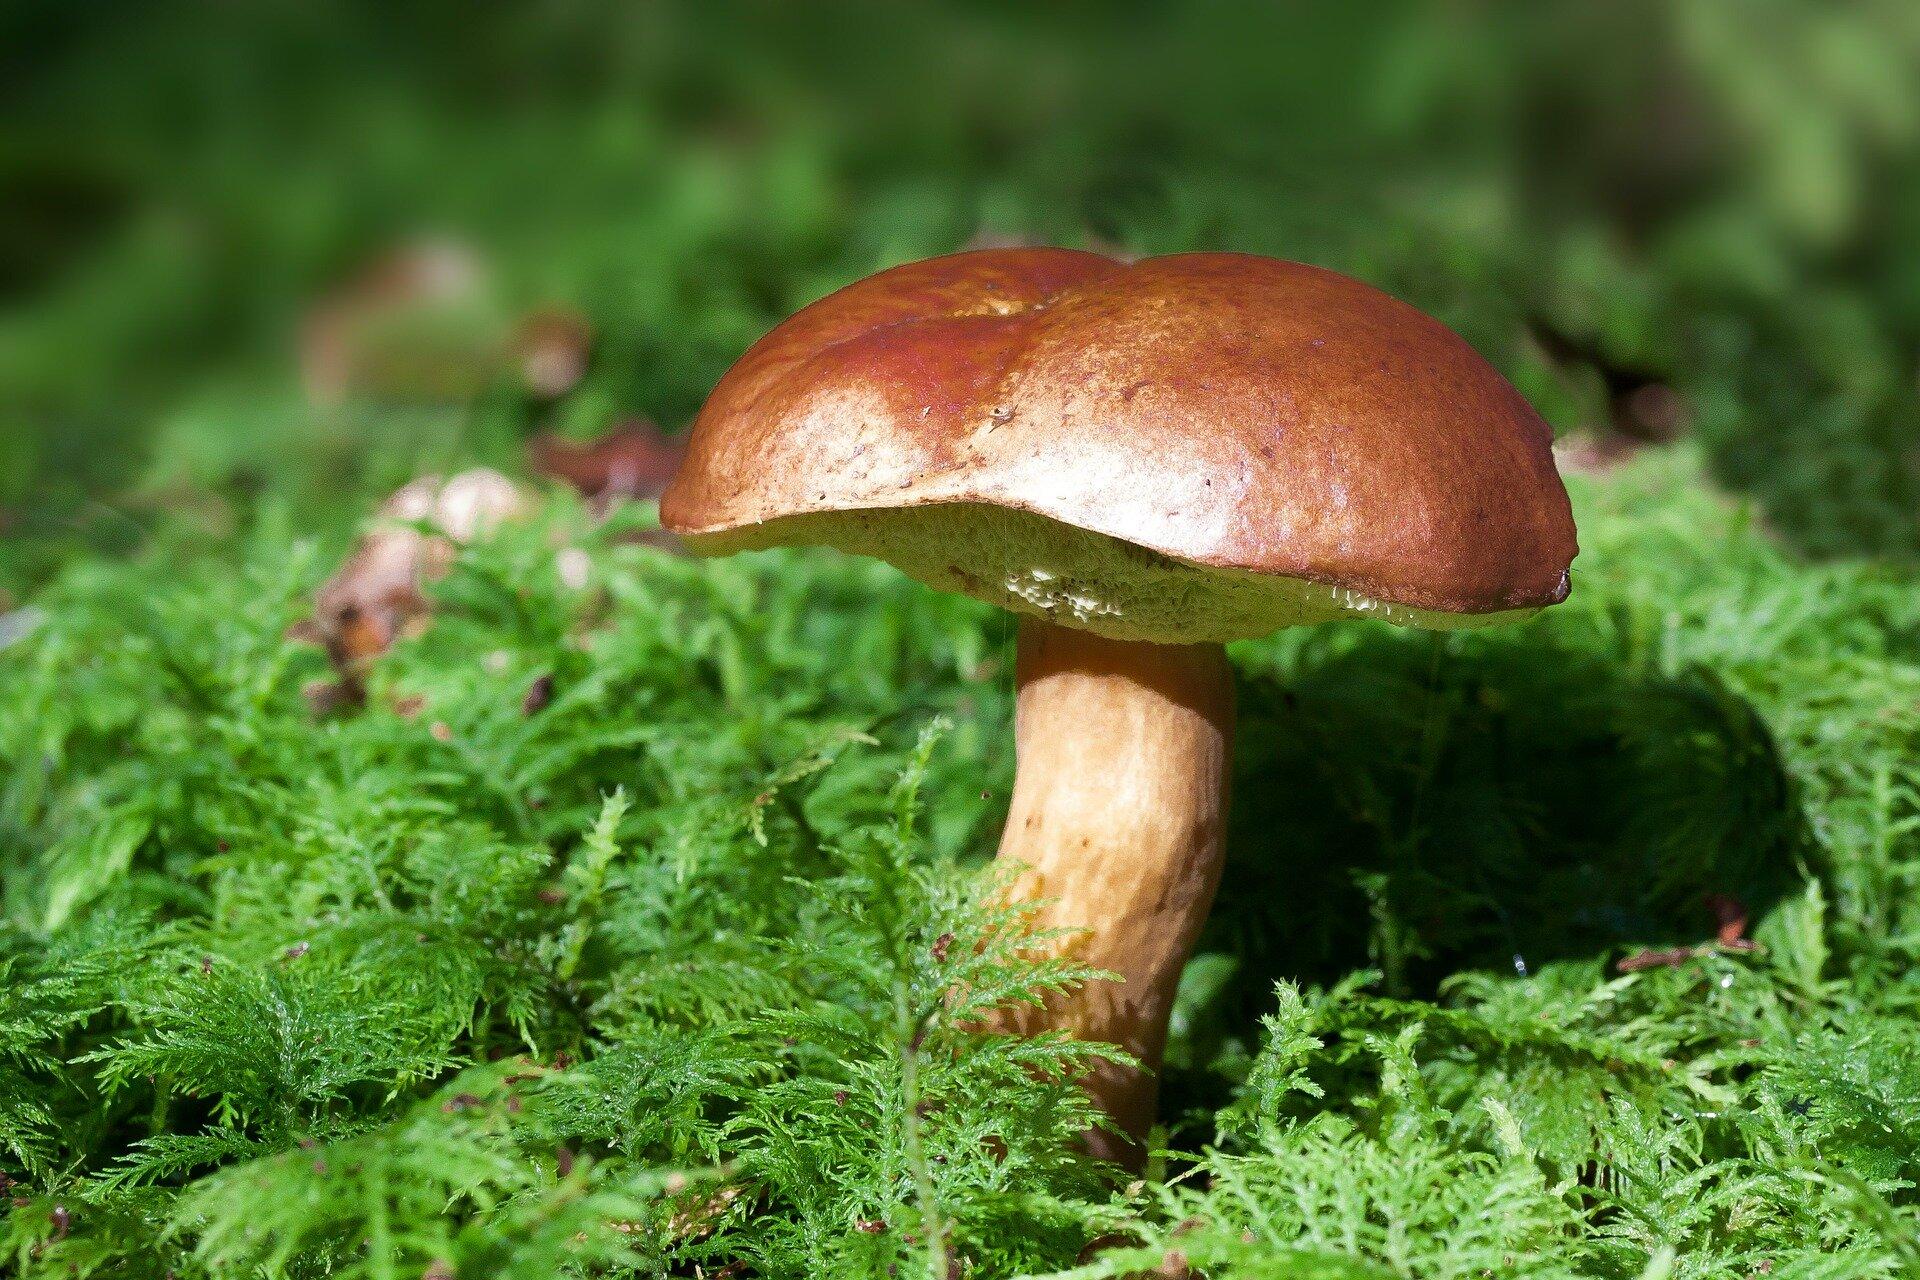 mushroom-448866_1920.jpg